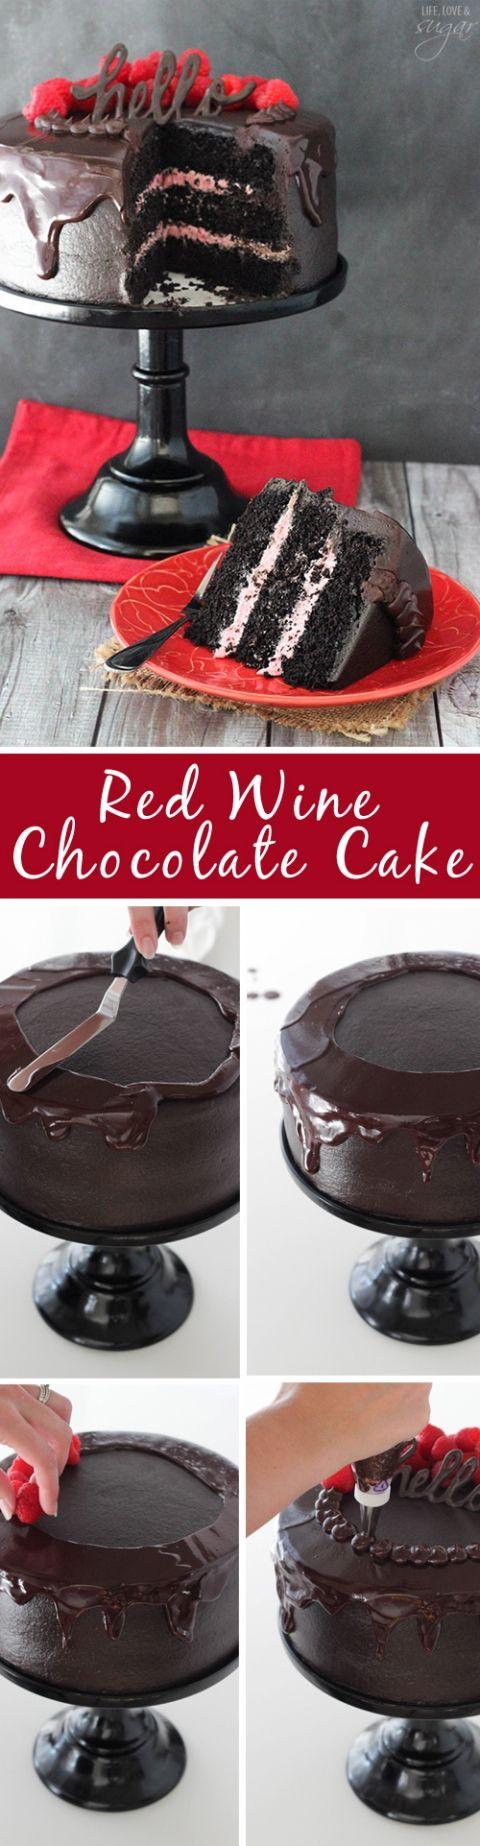 Red Wine Chocolate Cake Recipe Red Wine Chocolate Cake Cake Recipes Chocolate